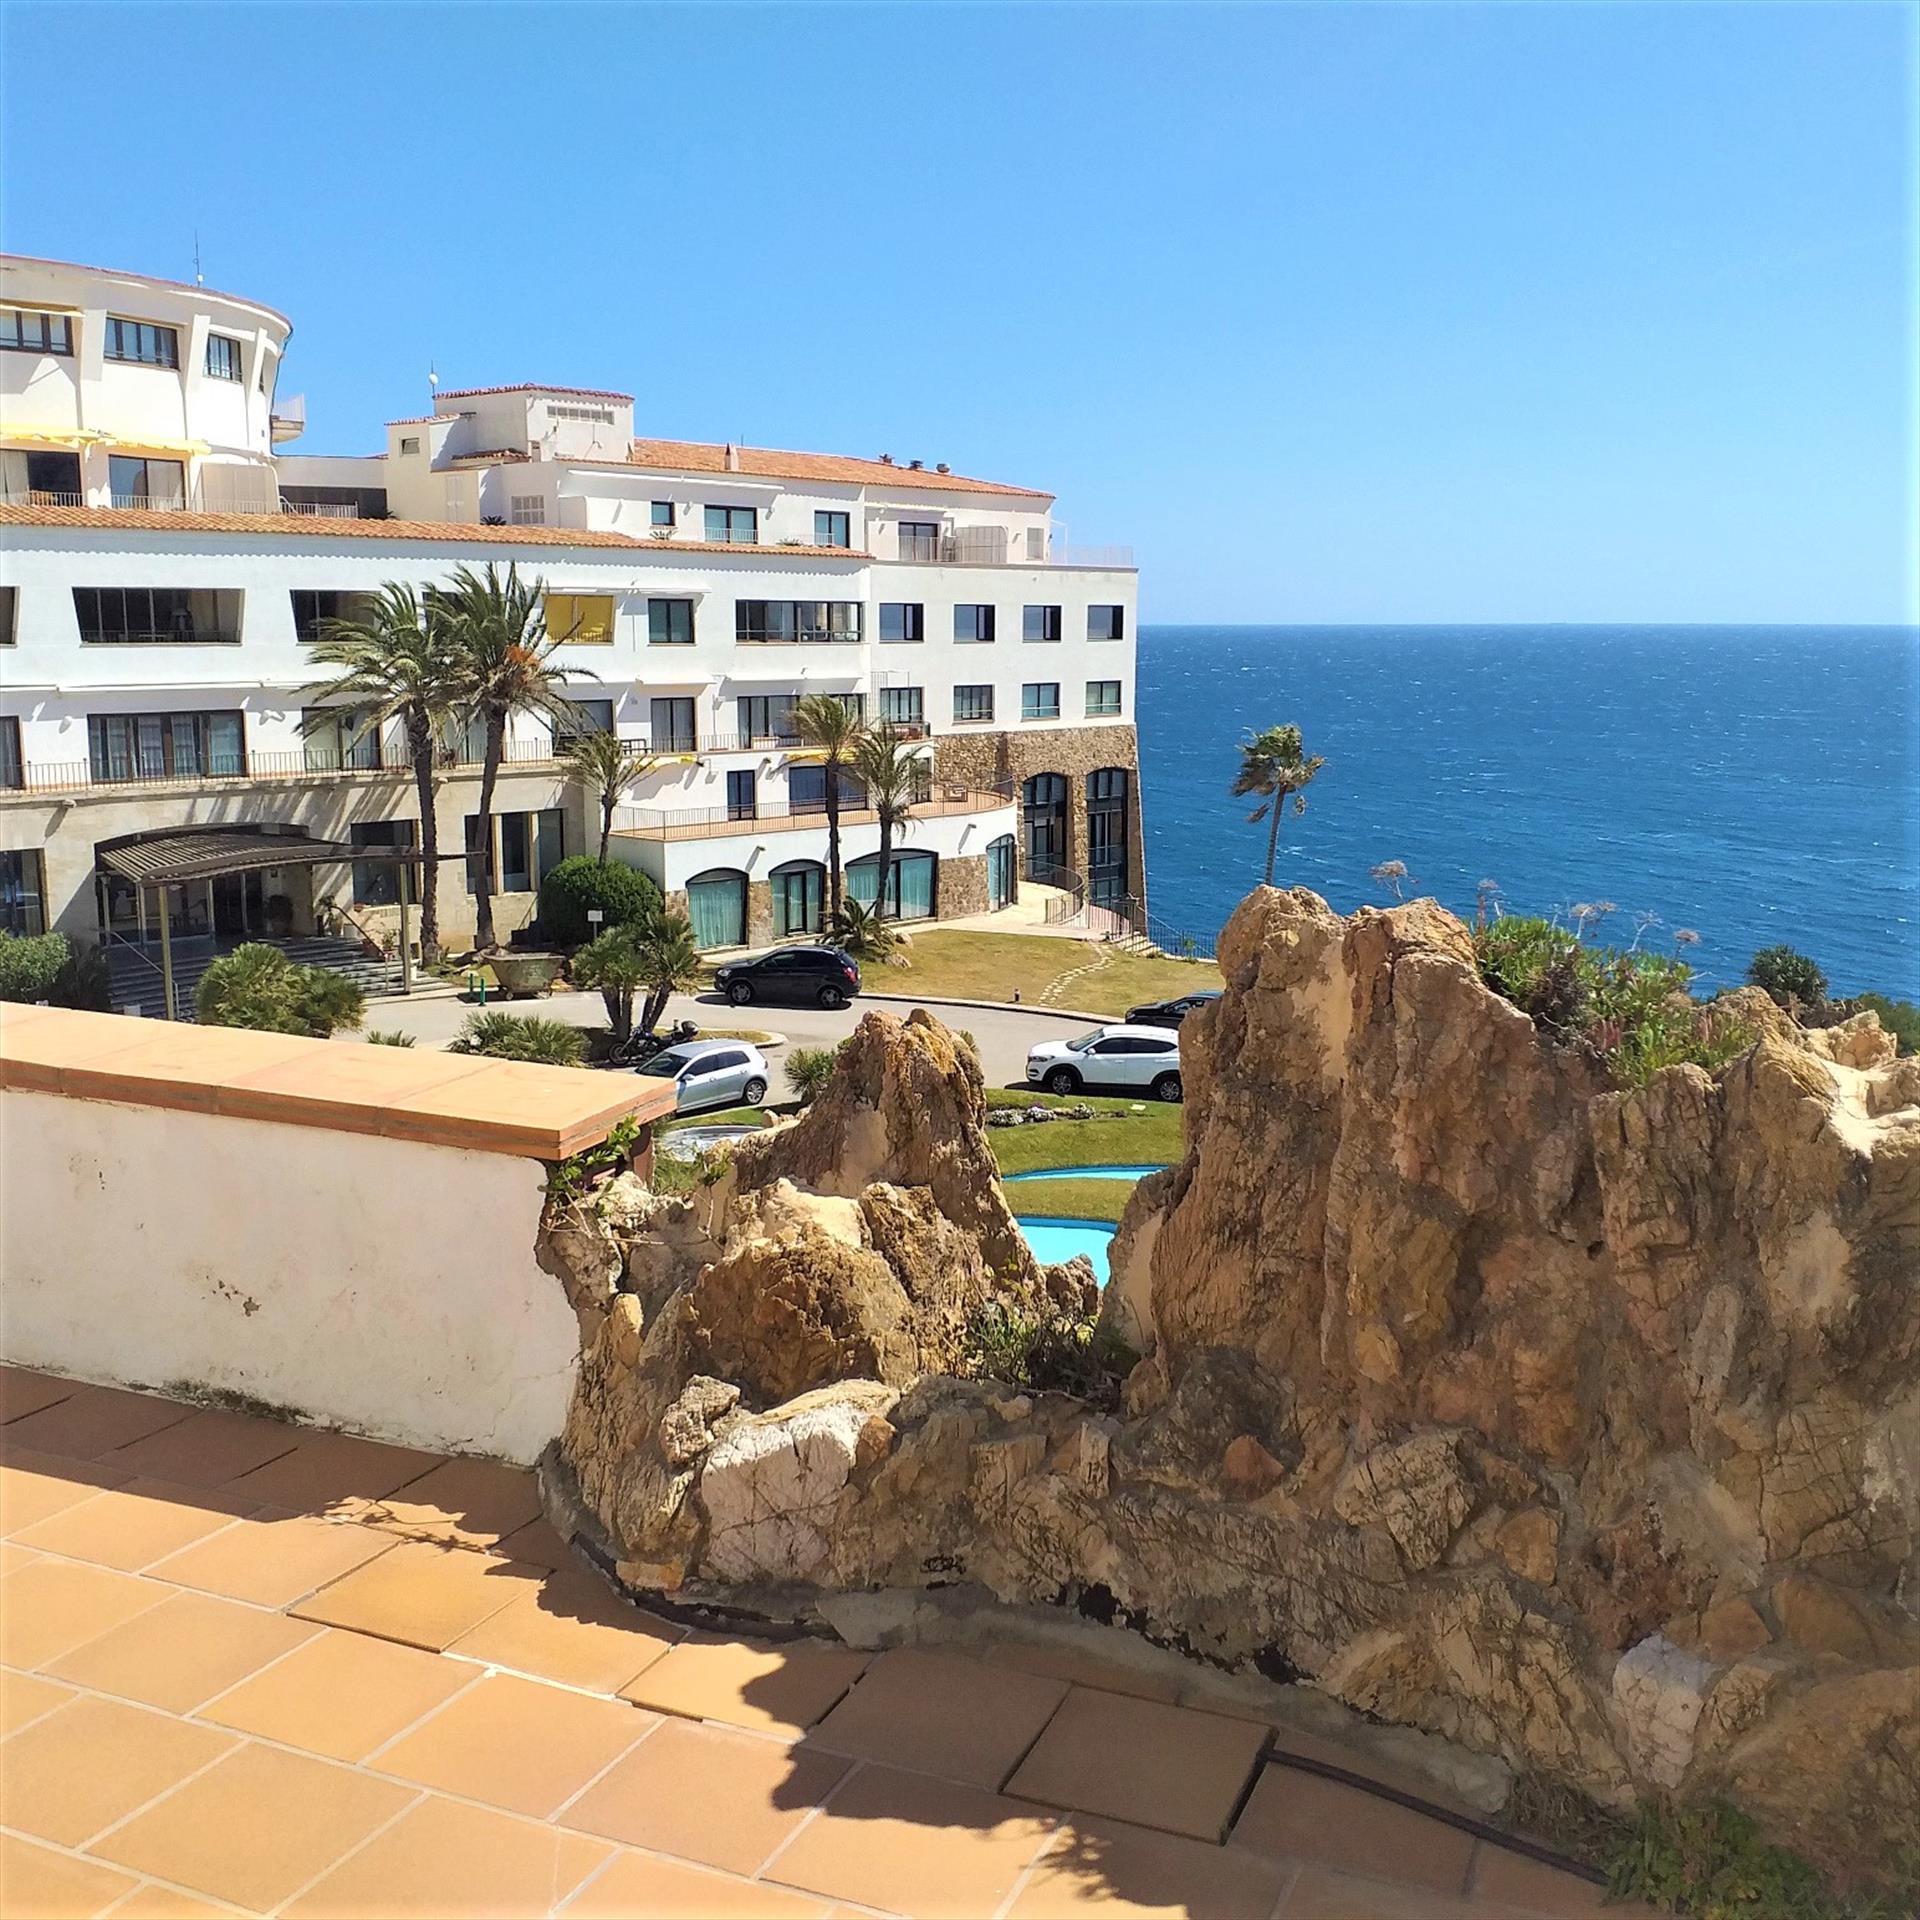 CSS 90 fantasticas vistas al mar con gran terraza y piscina comunitaria,Grand appartement charmant  avec piscine communale à Begur, sur la Costa Brava, Espagne pour 8 personnes.....